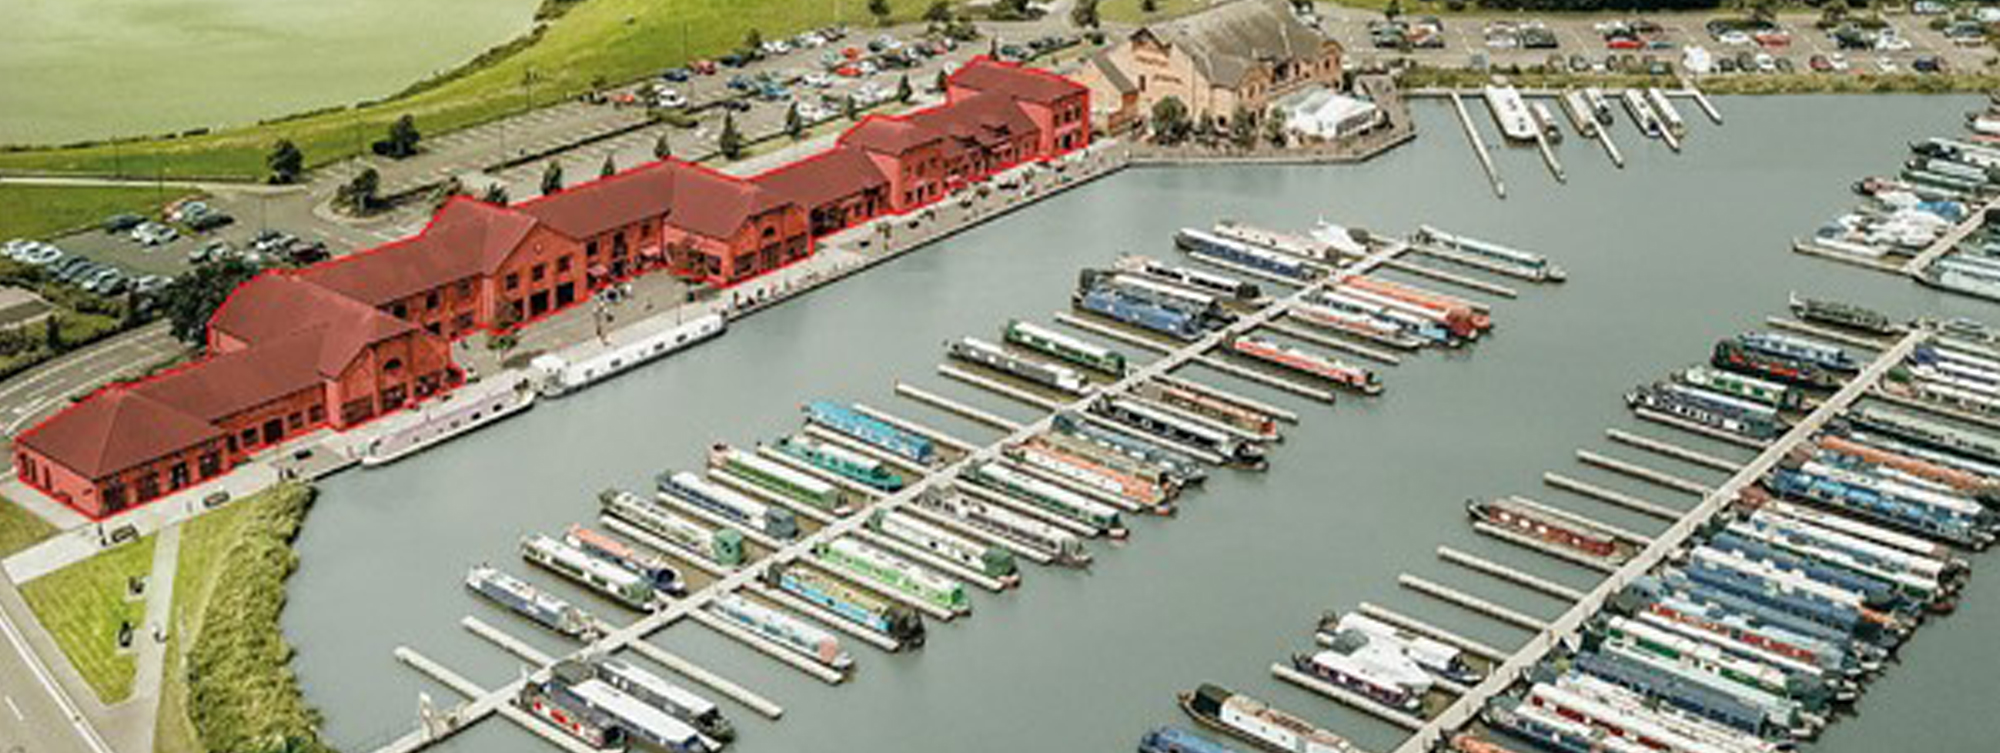 Barton Marina - Multi-let Retail Investment